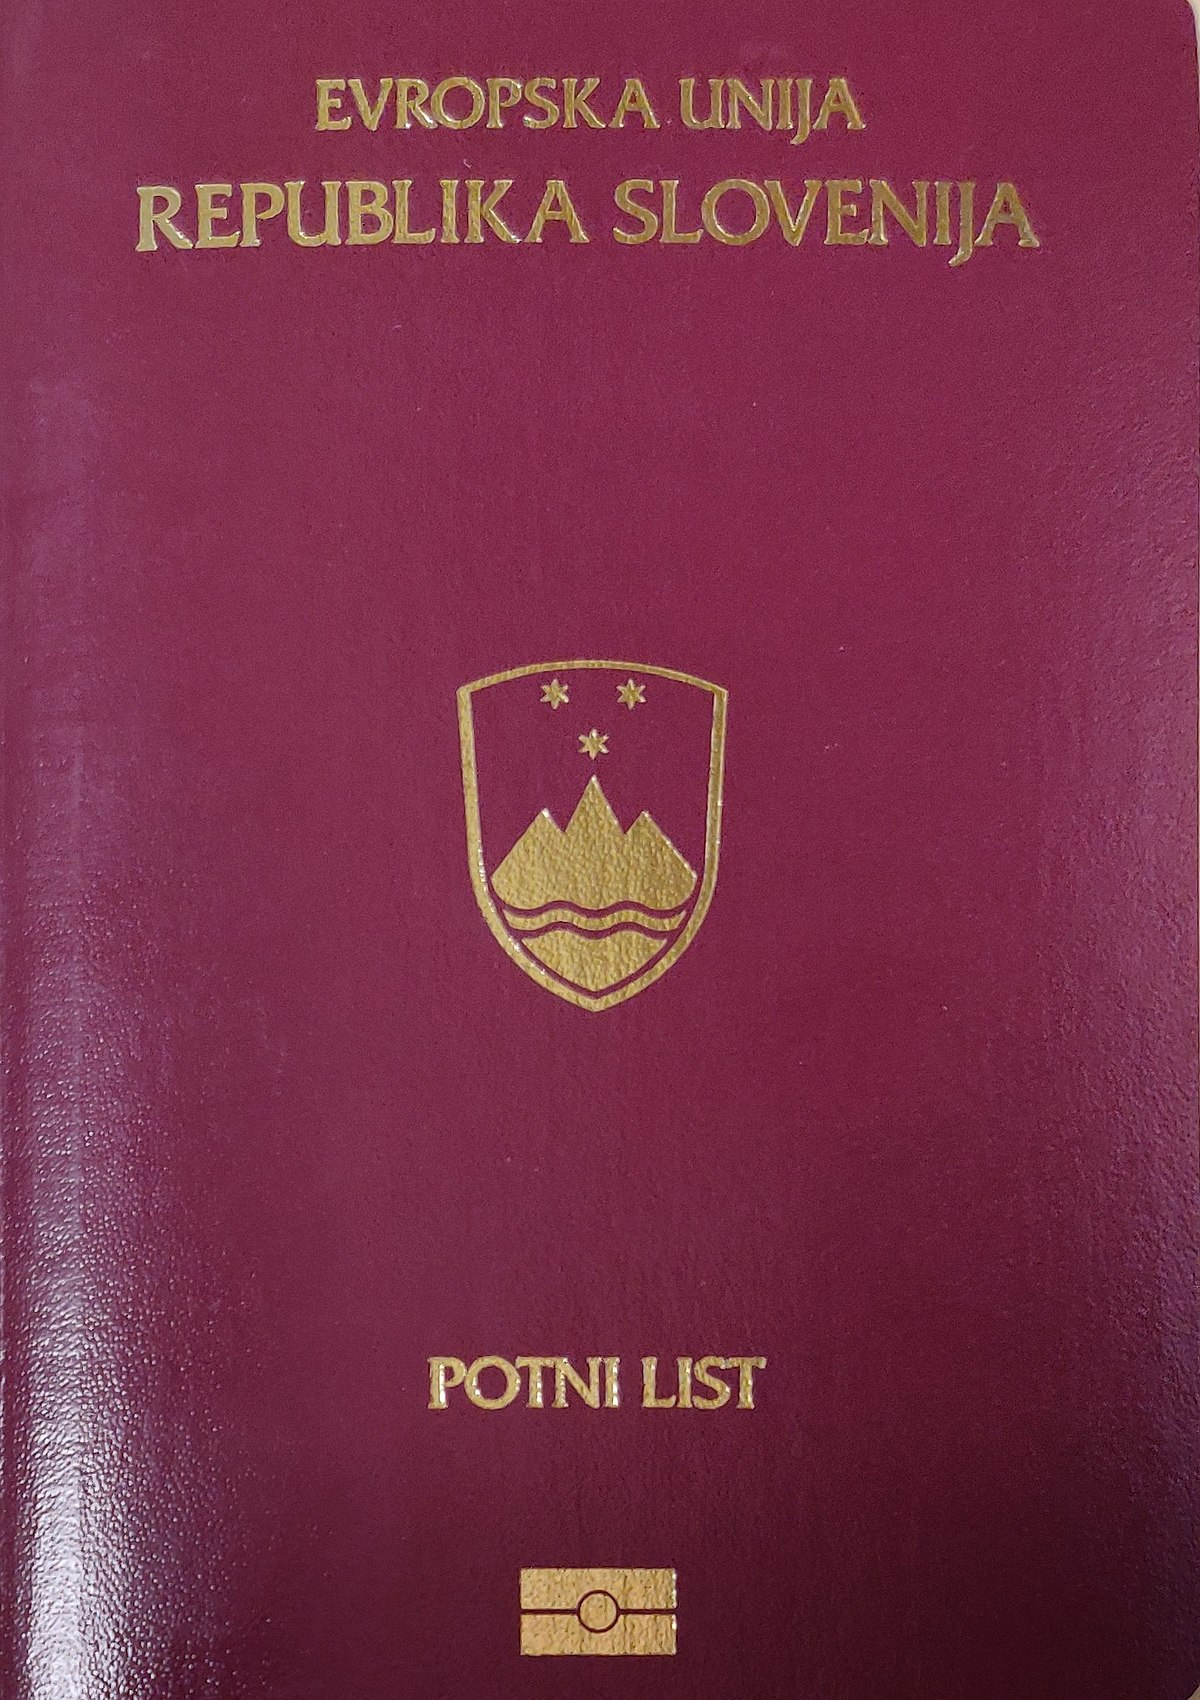 Passports of the European Union - Wikipedia